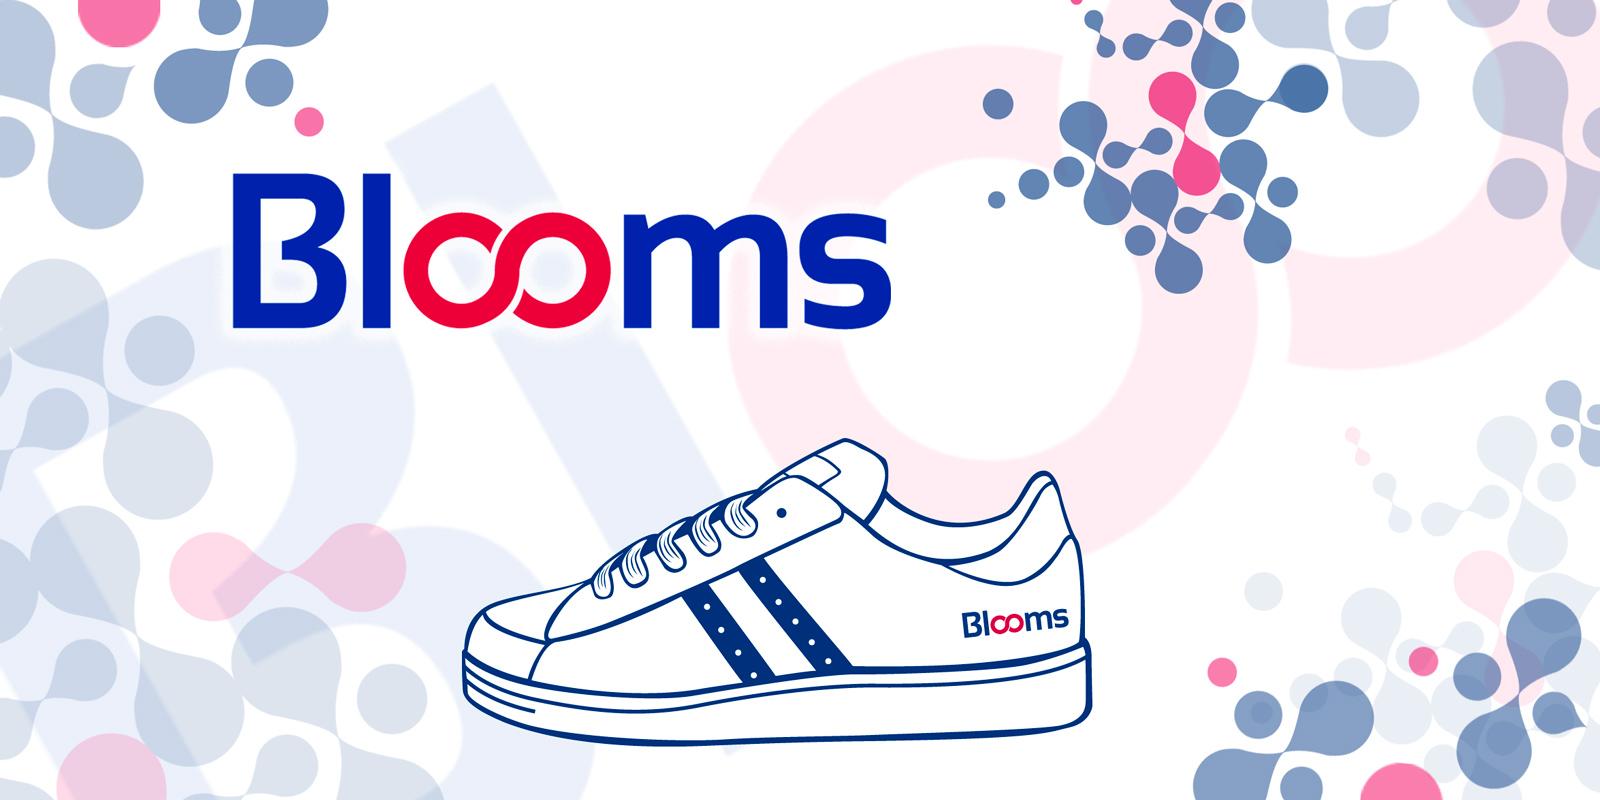 TM Blooms;;;;;;Разработка Логотипа;;;;;;<span>Клиент:</span> TM Blooms;;;;;;;;;;;;Разработка Логотипа;;;;;;1